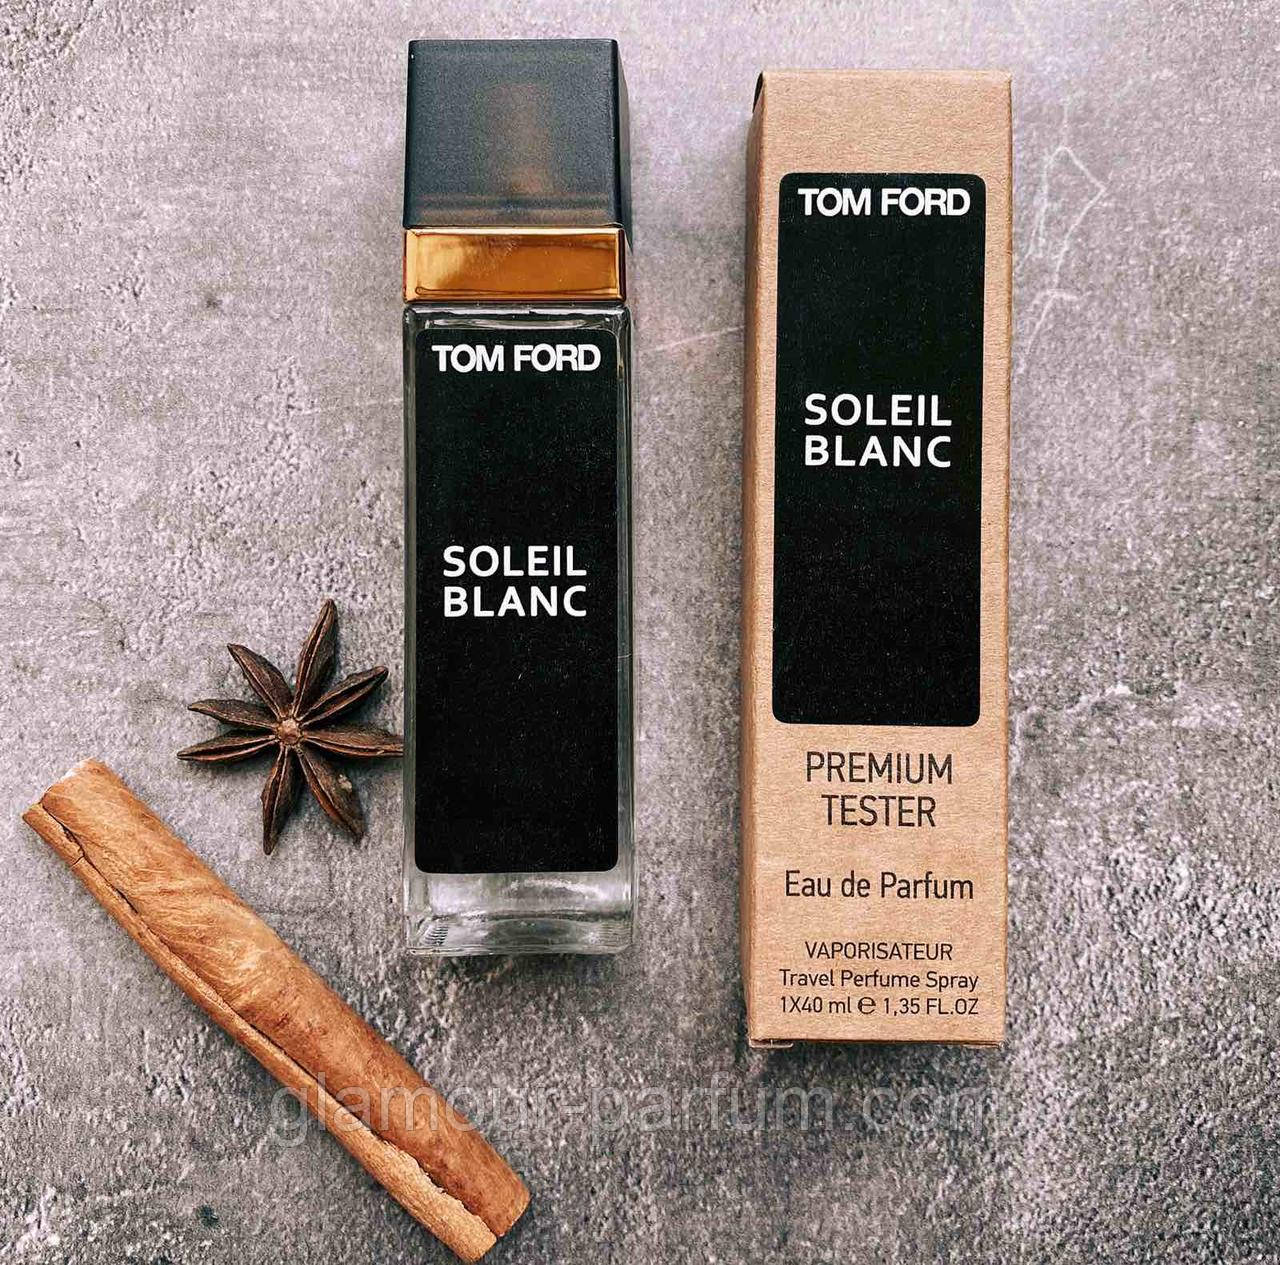 TESTER мини-парфюм Tom Ford Soleil Blanc (Том Форд Солейл Блон) 40мл реплика ОПТ